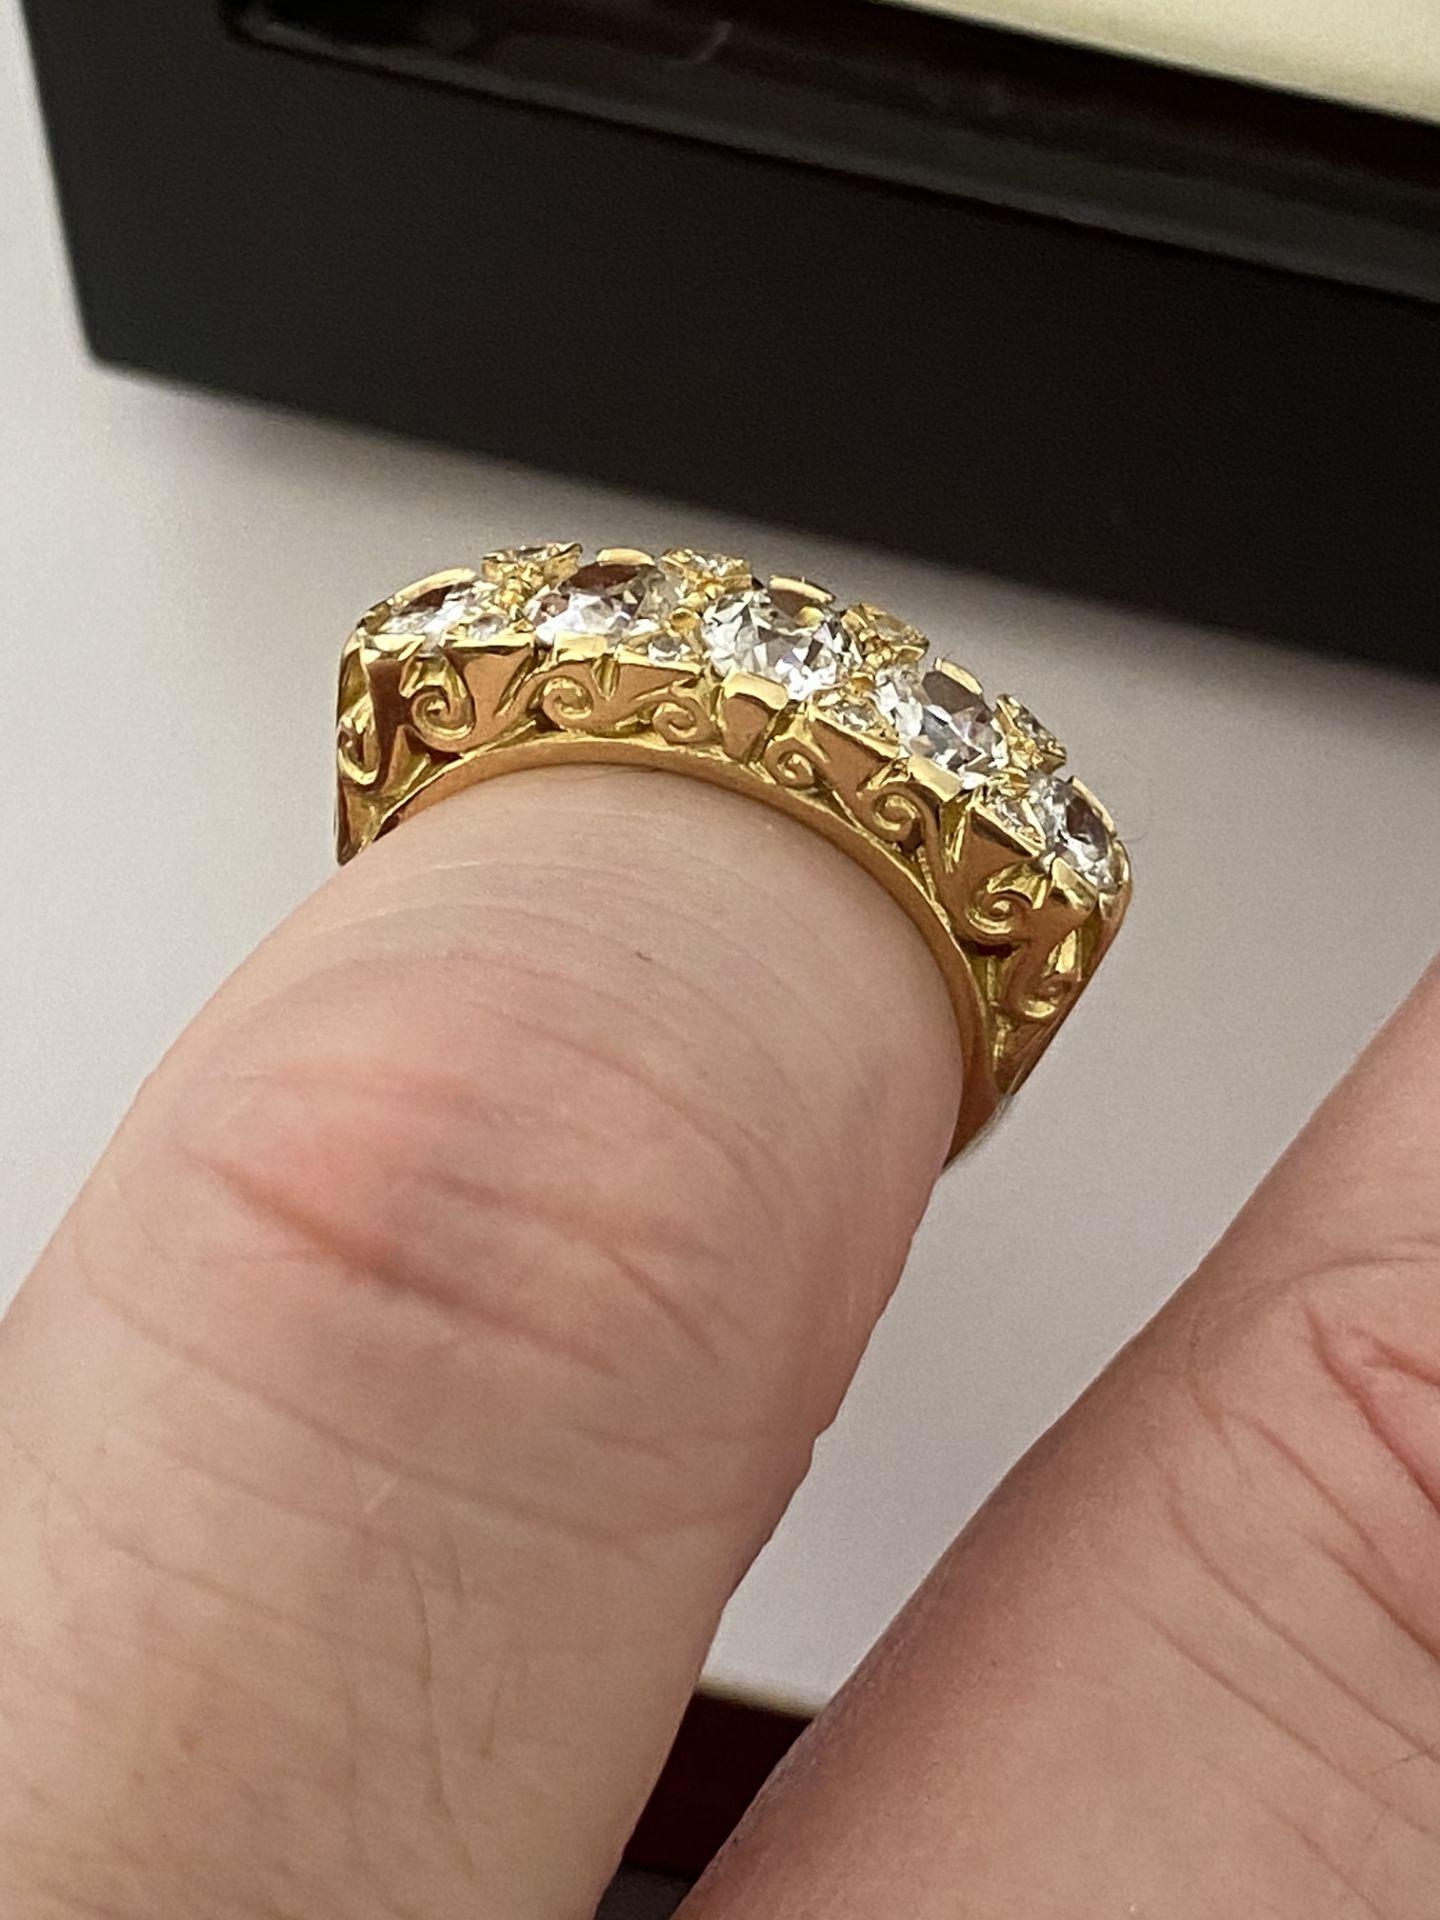 FINE 18ct YELLOW GOLD 2.00ct 5 STONE DIAMOND RING - Image 14 of 15